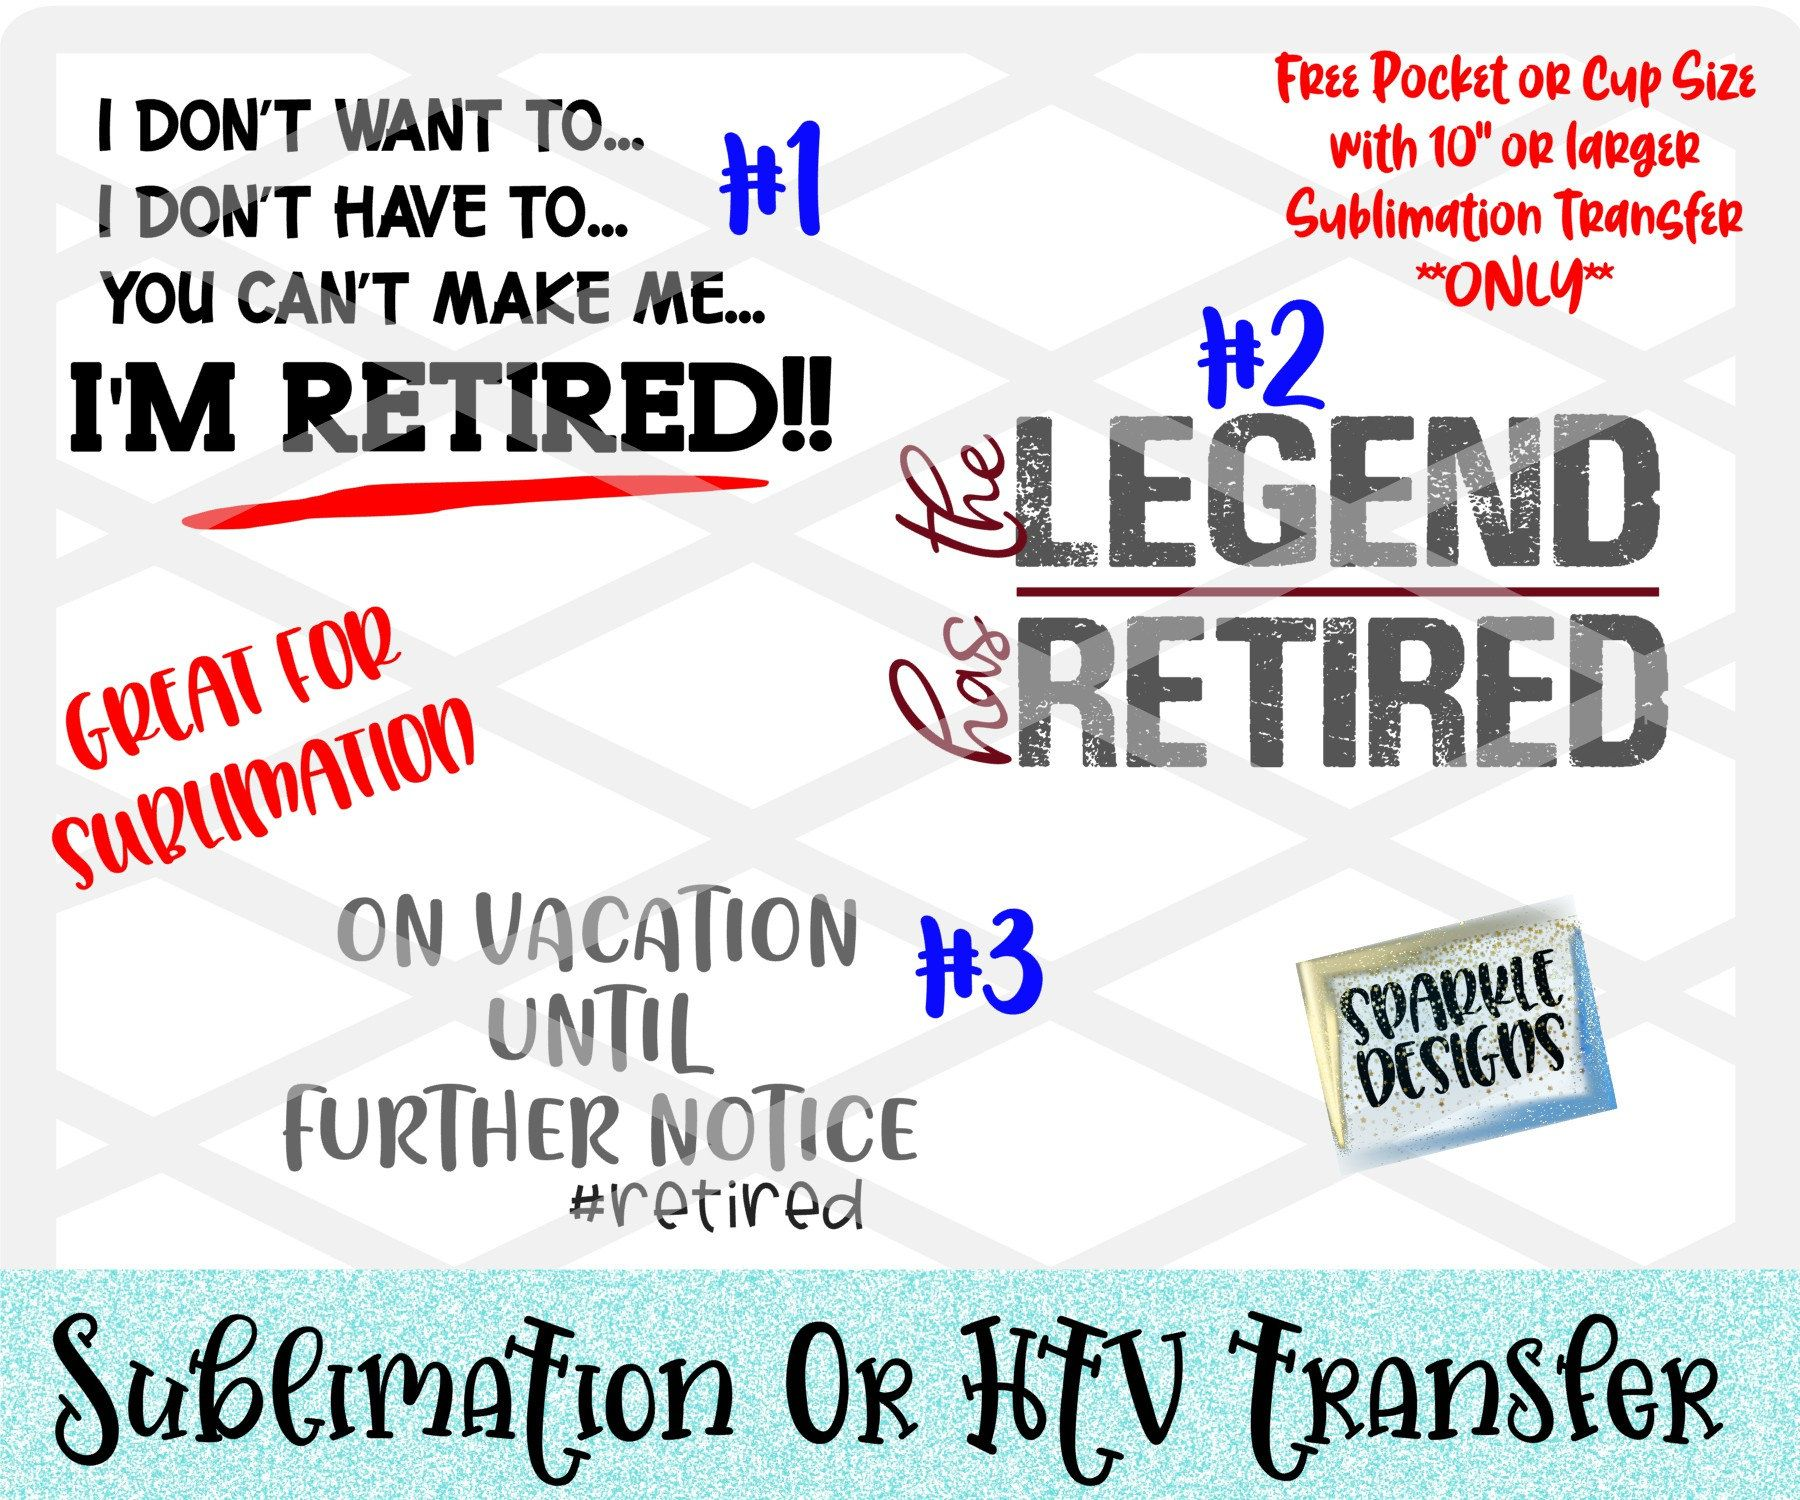 Retirement Designs Htv Transfer Sublimation Transfer Heat Transfer Vinyl Ready To Press Diy Iron On Retired The Legend Has Retired Printable Vinyl Heat Transfer Vinyl Htv